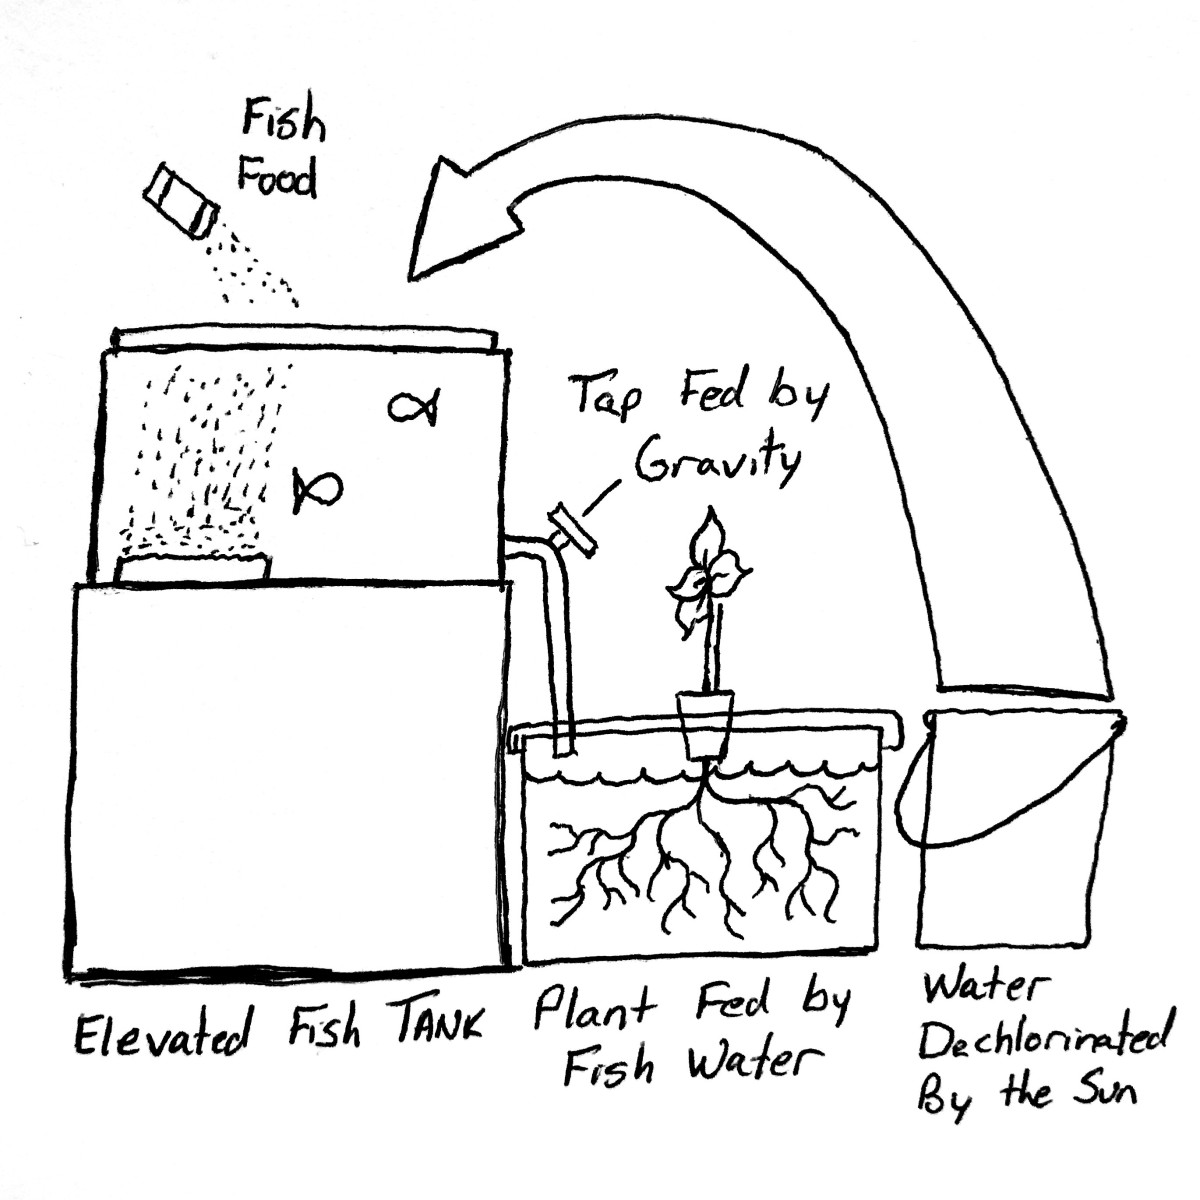 aquaponigarden